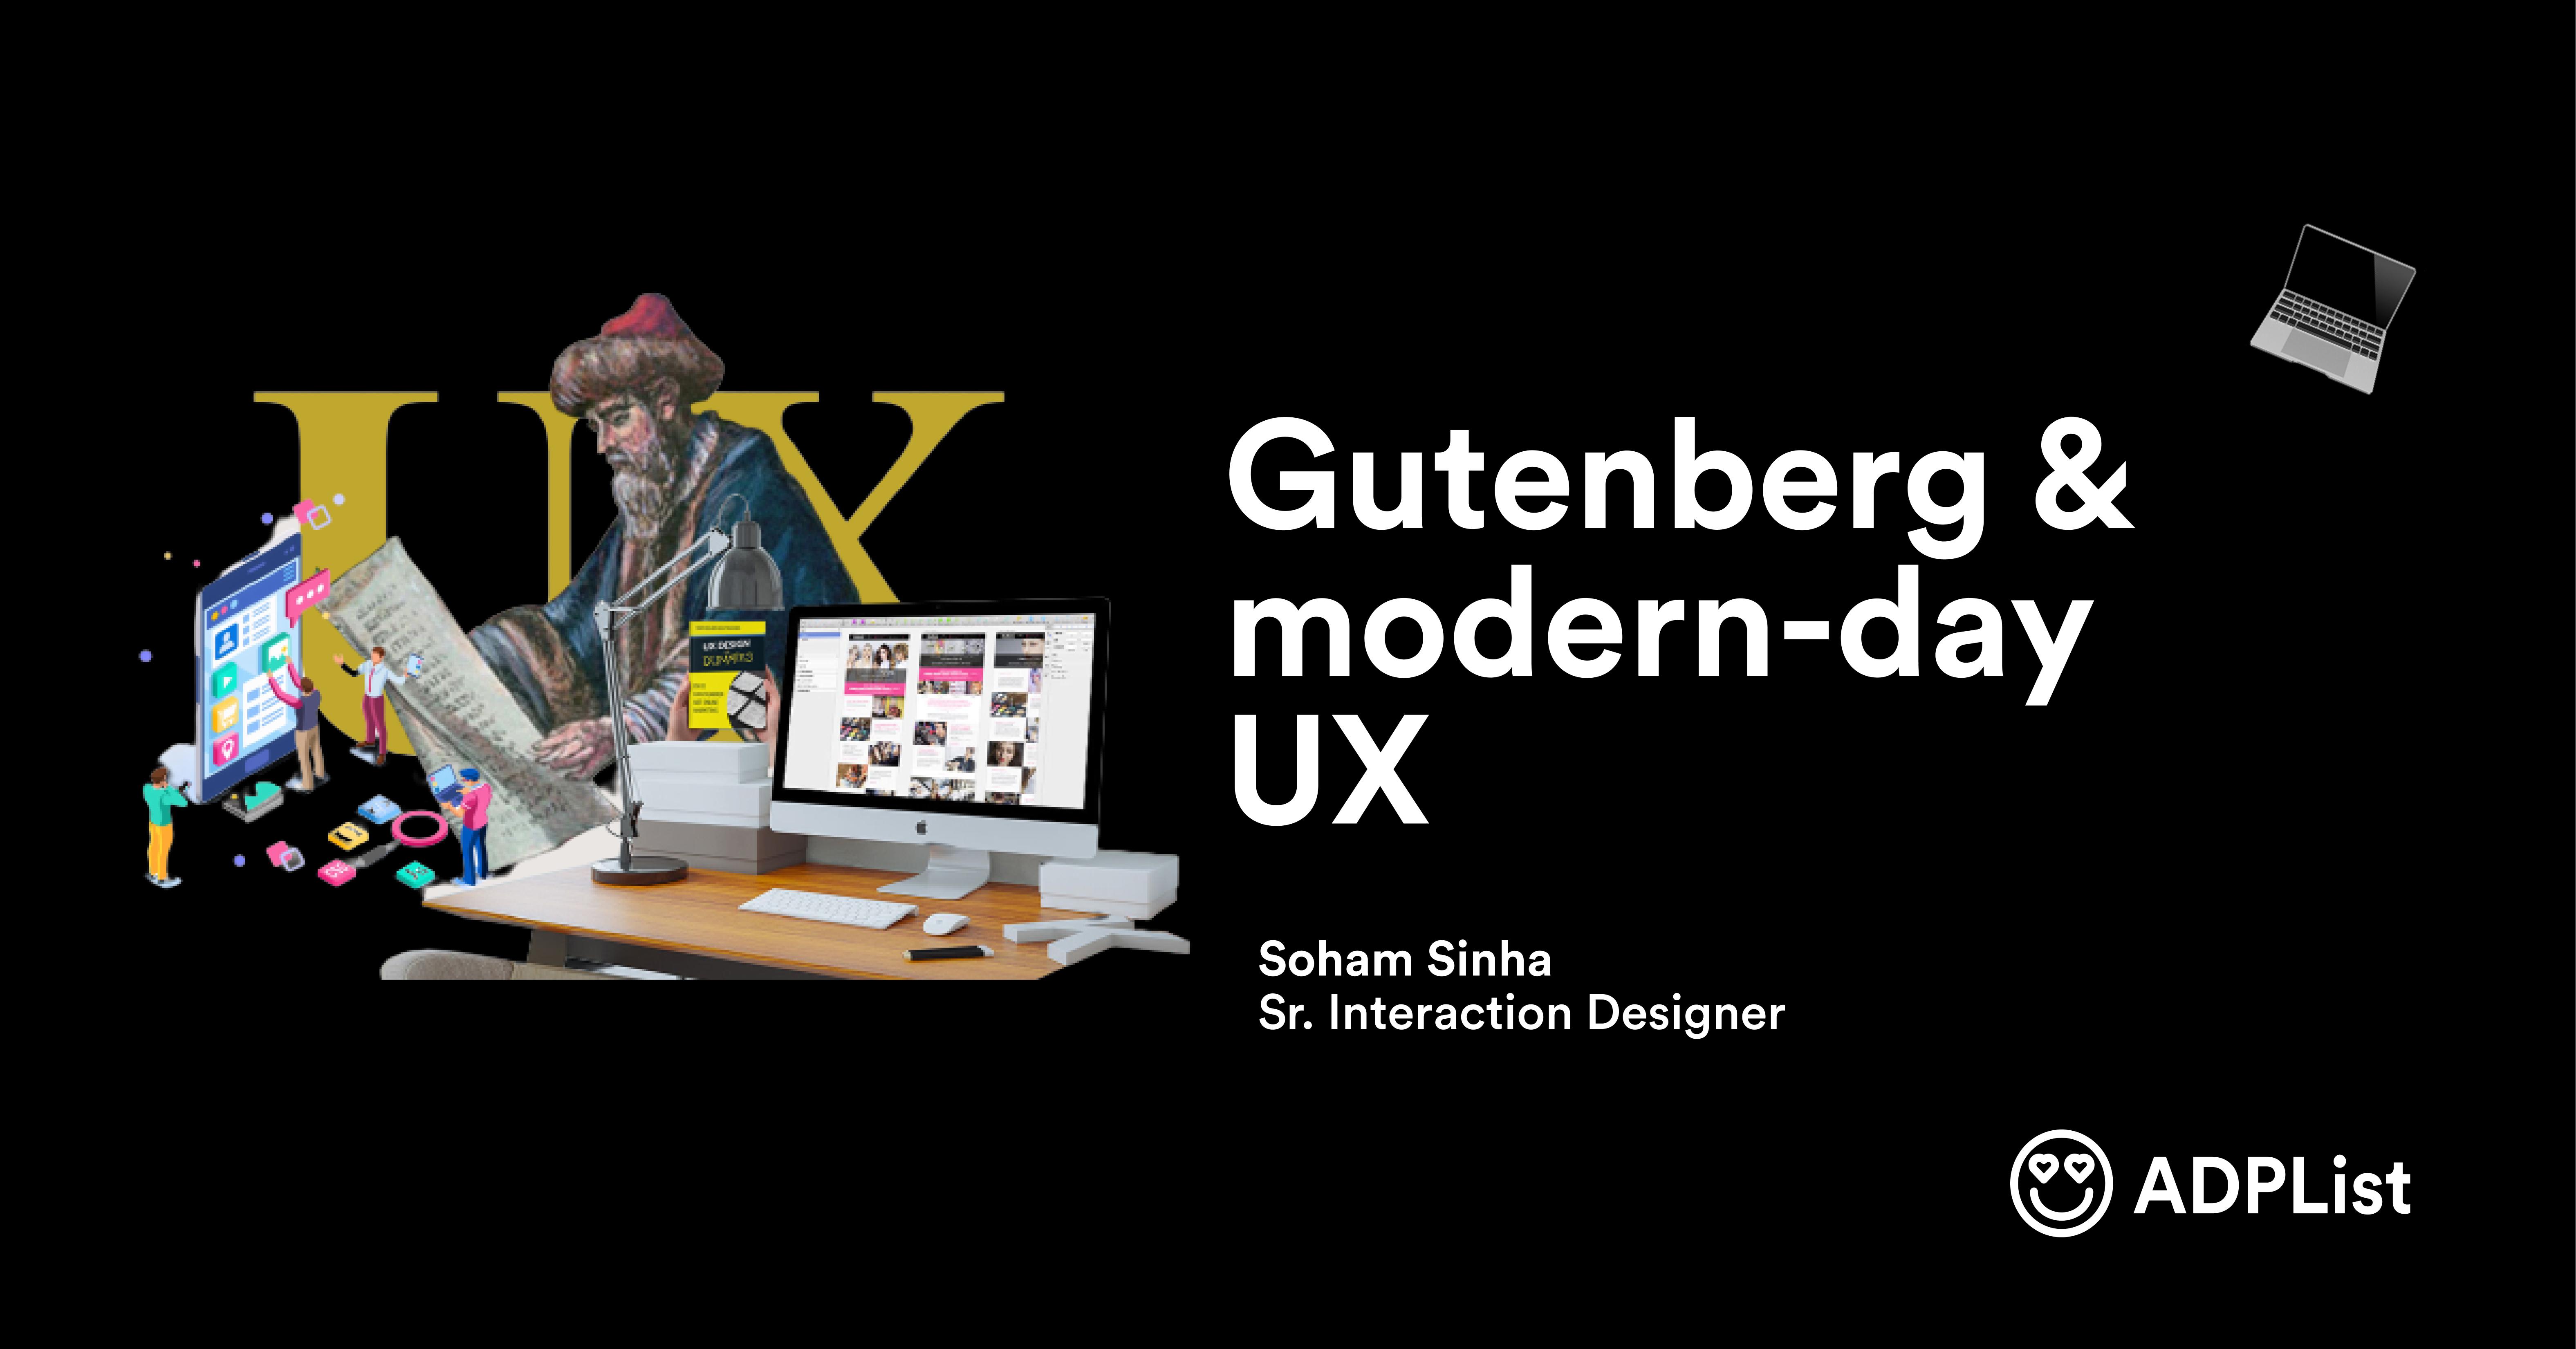 Gutenberg & modern-day UX